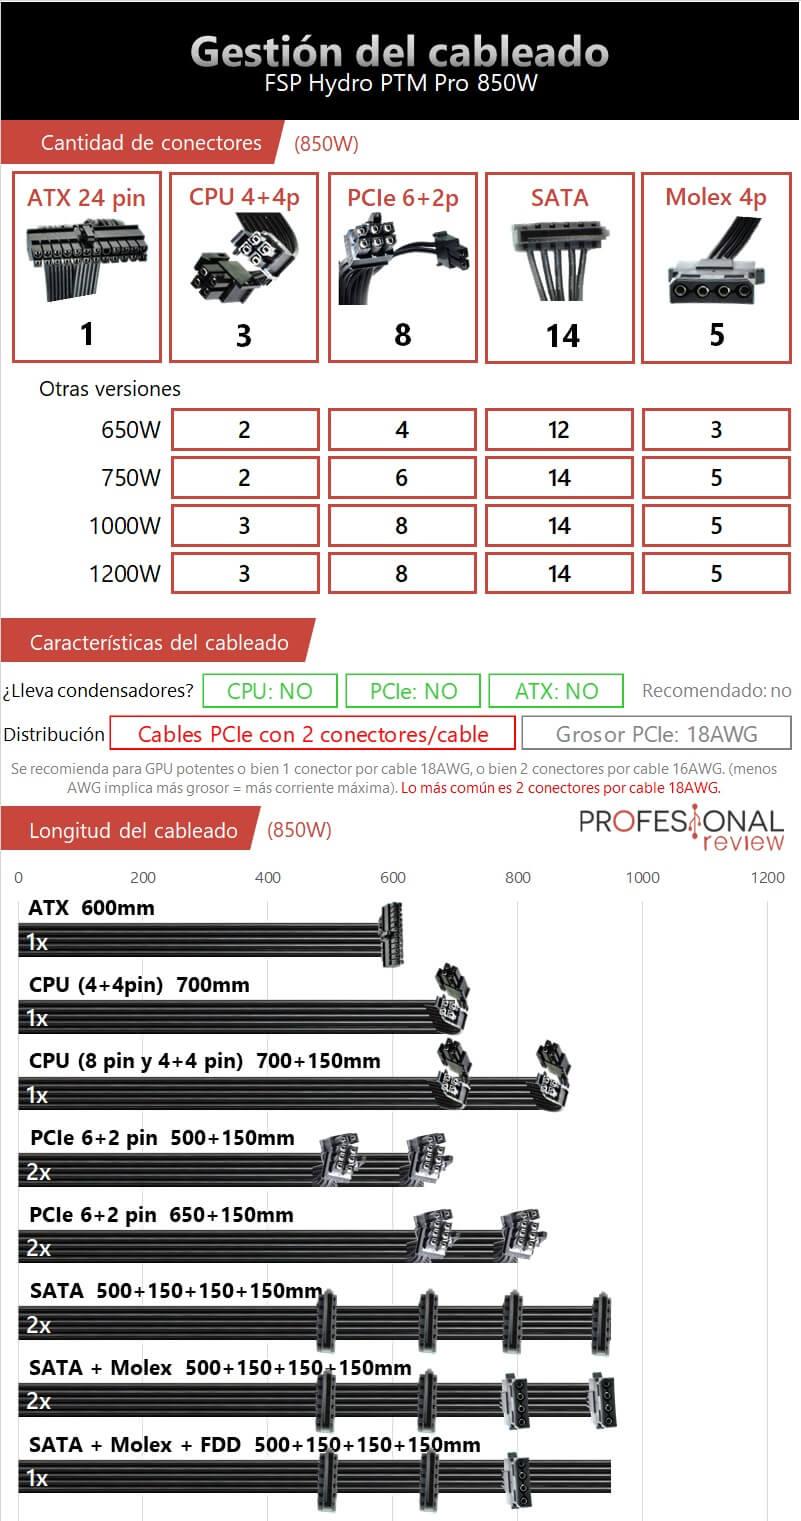 FSP Hydro PTM Pro 850W Gestion del cableado